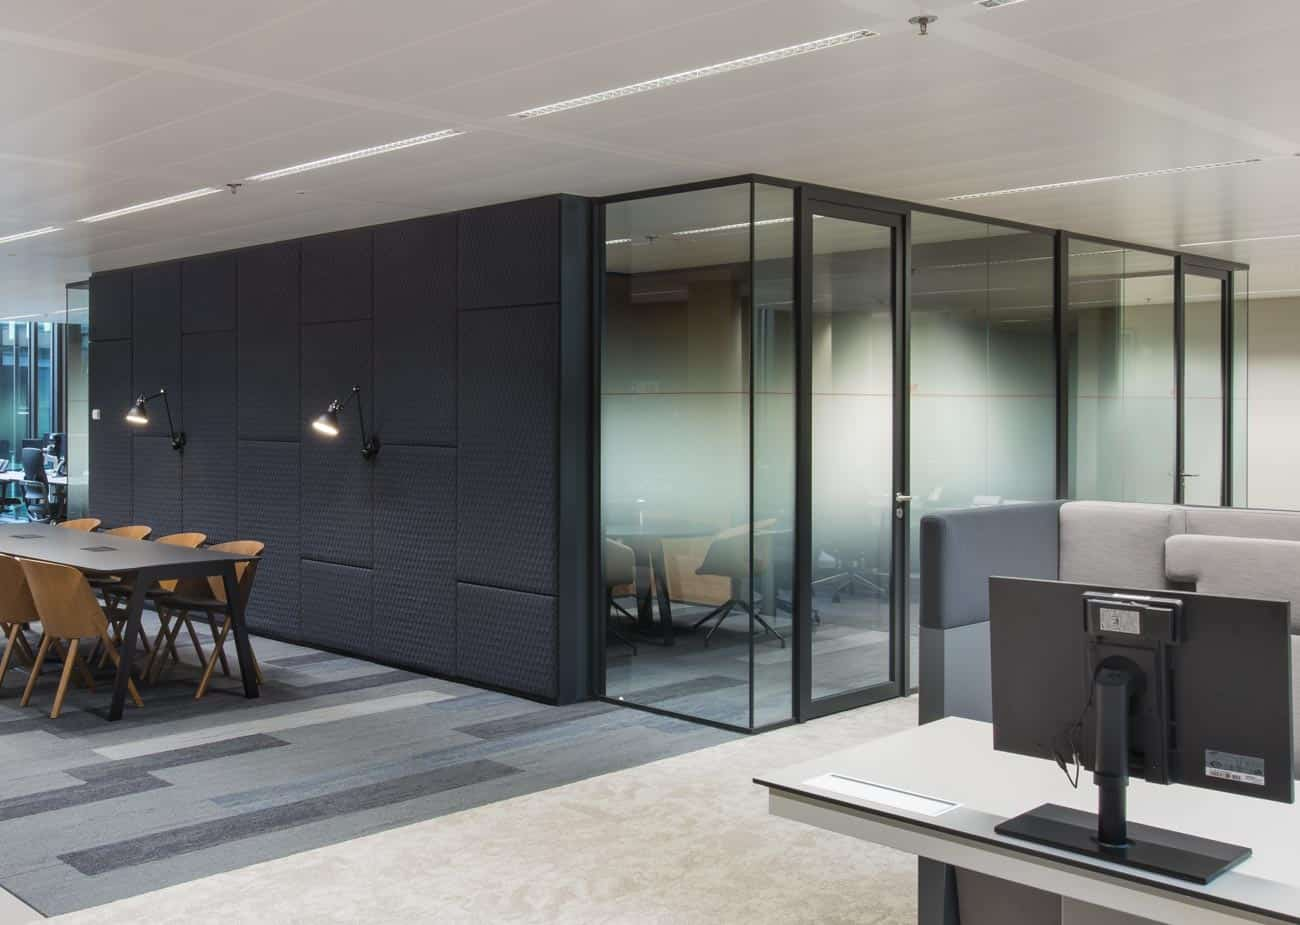 Belastingdienst, Breda | Plan Effect